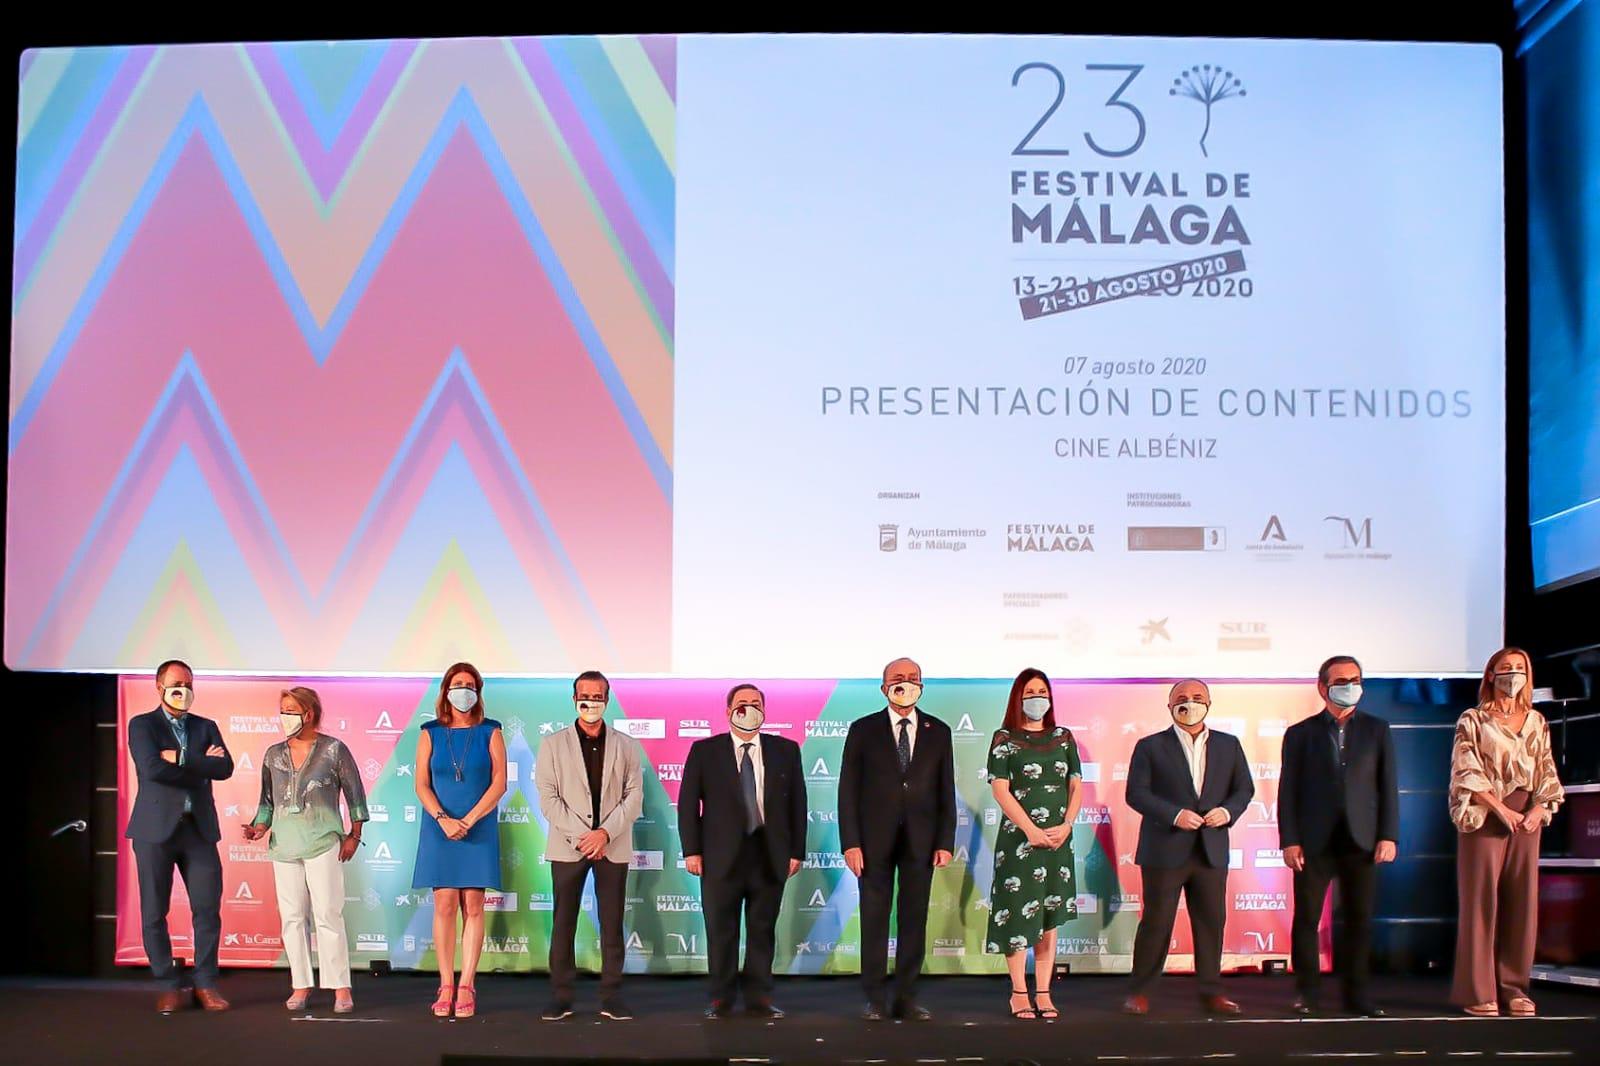 Agosto será el mes de cine en Málaga. Festival de Málaga